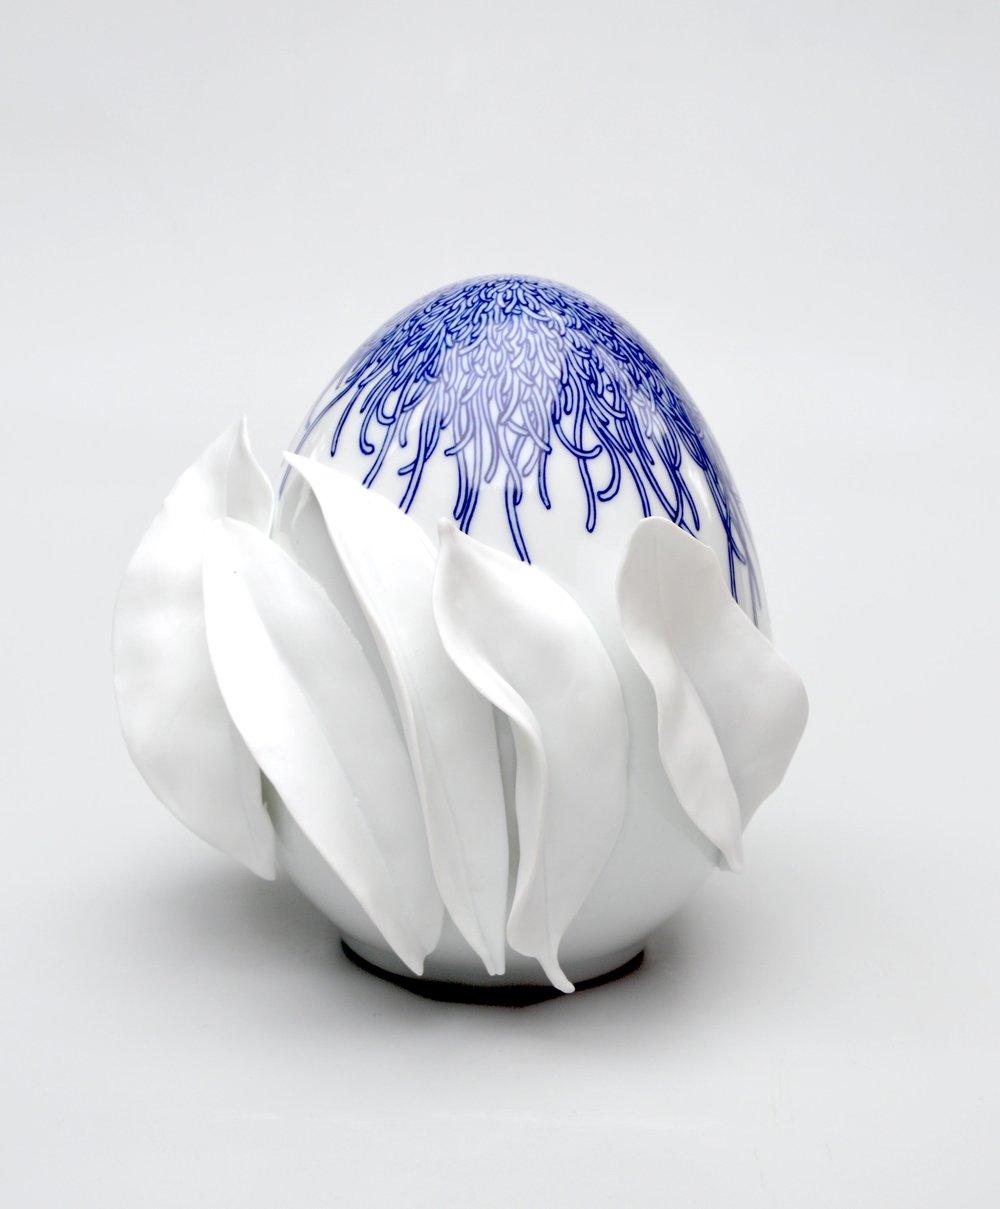 Bleu knoll